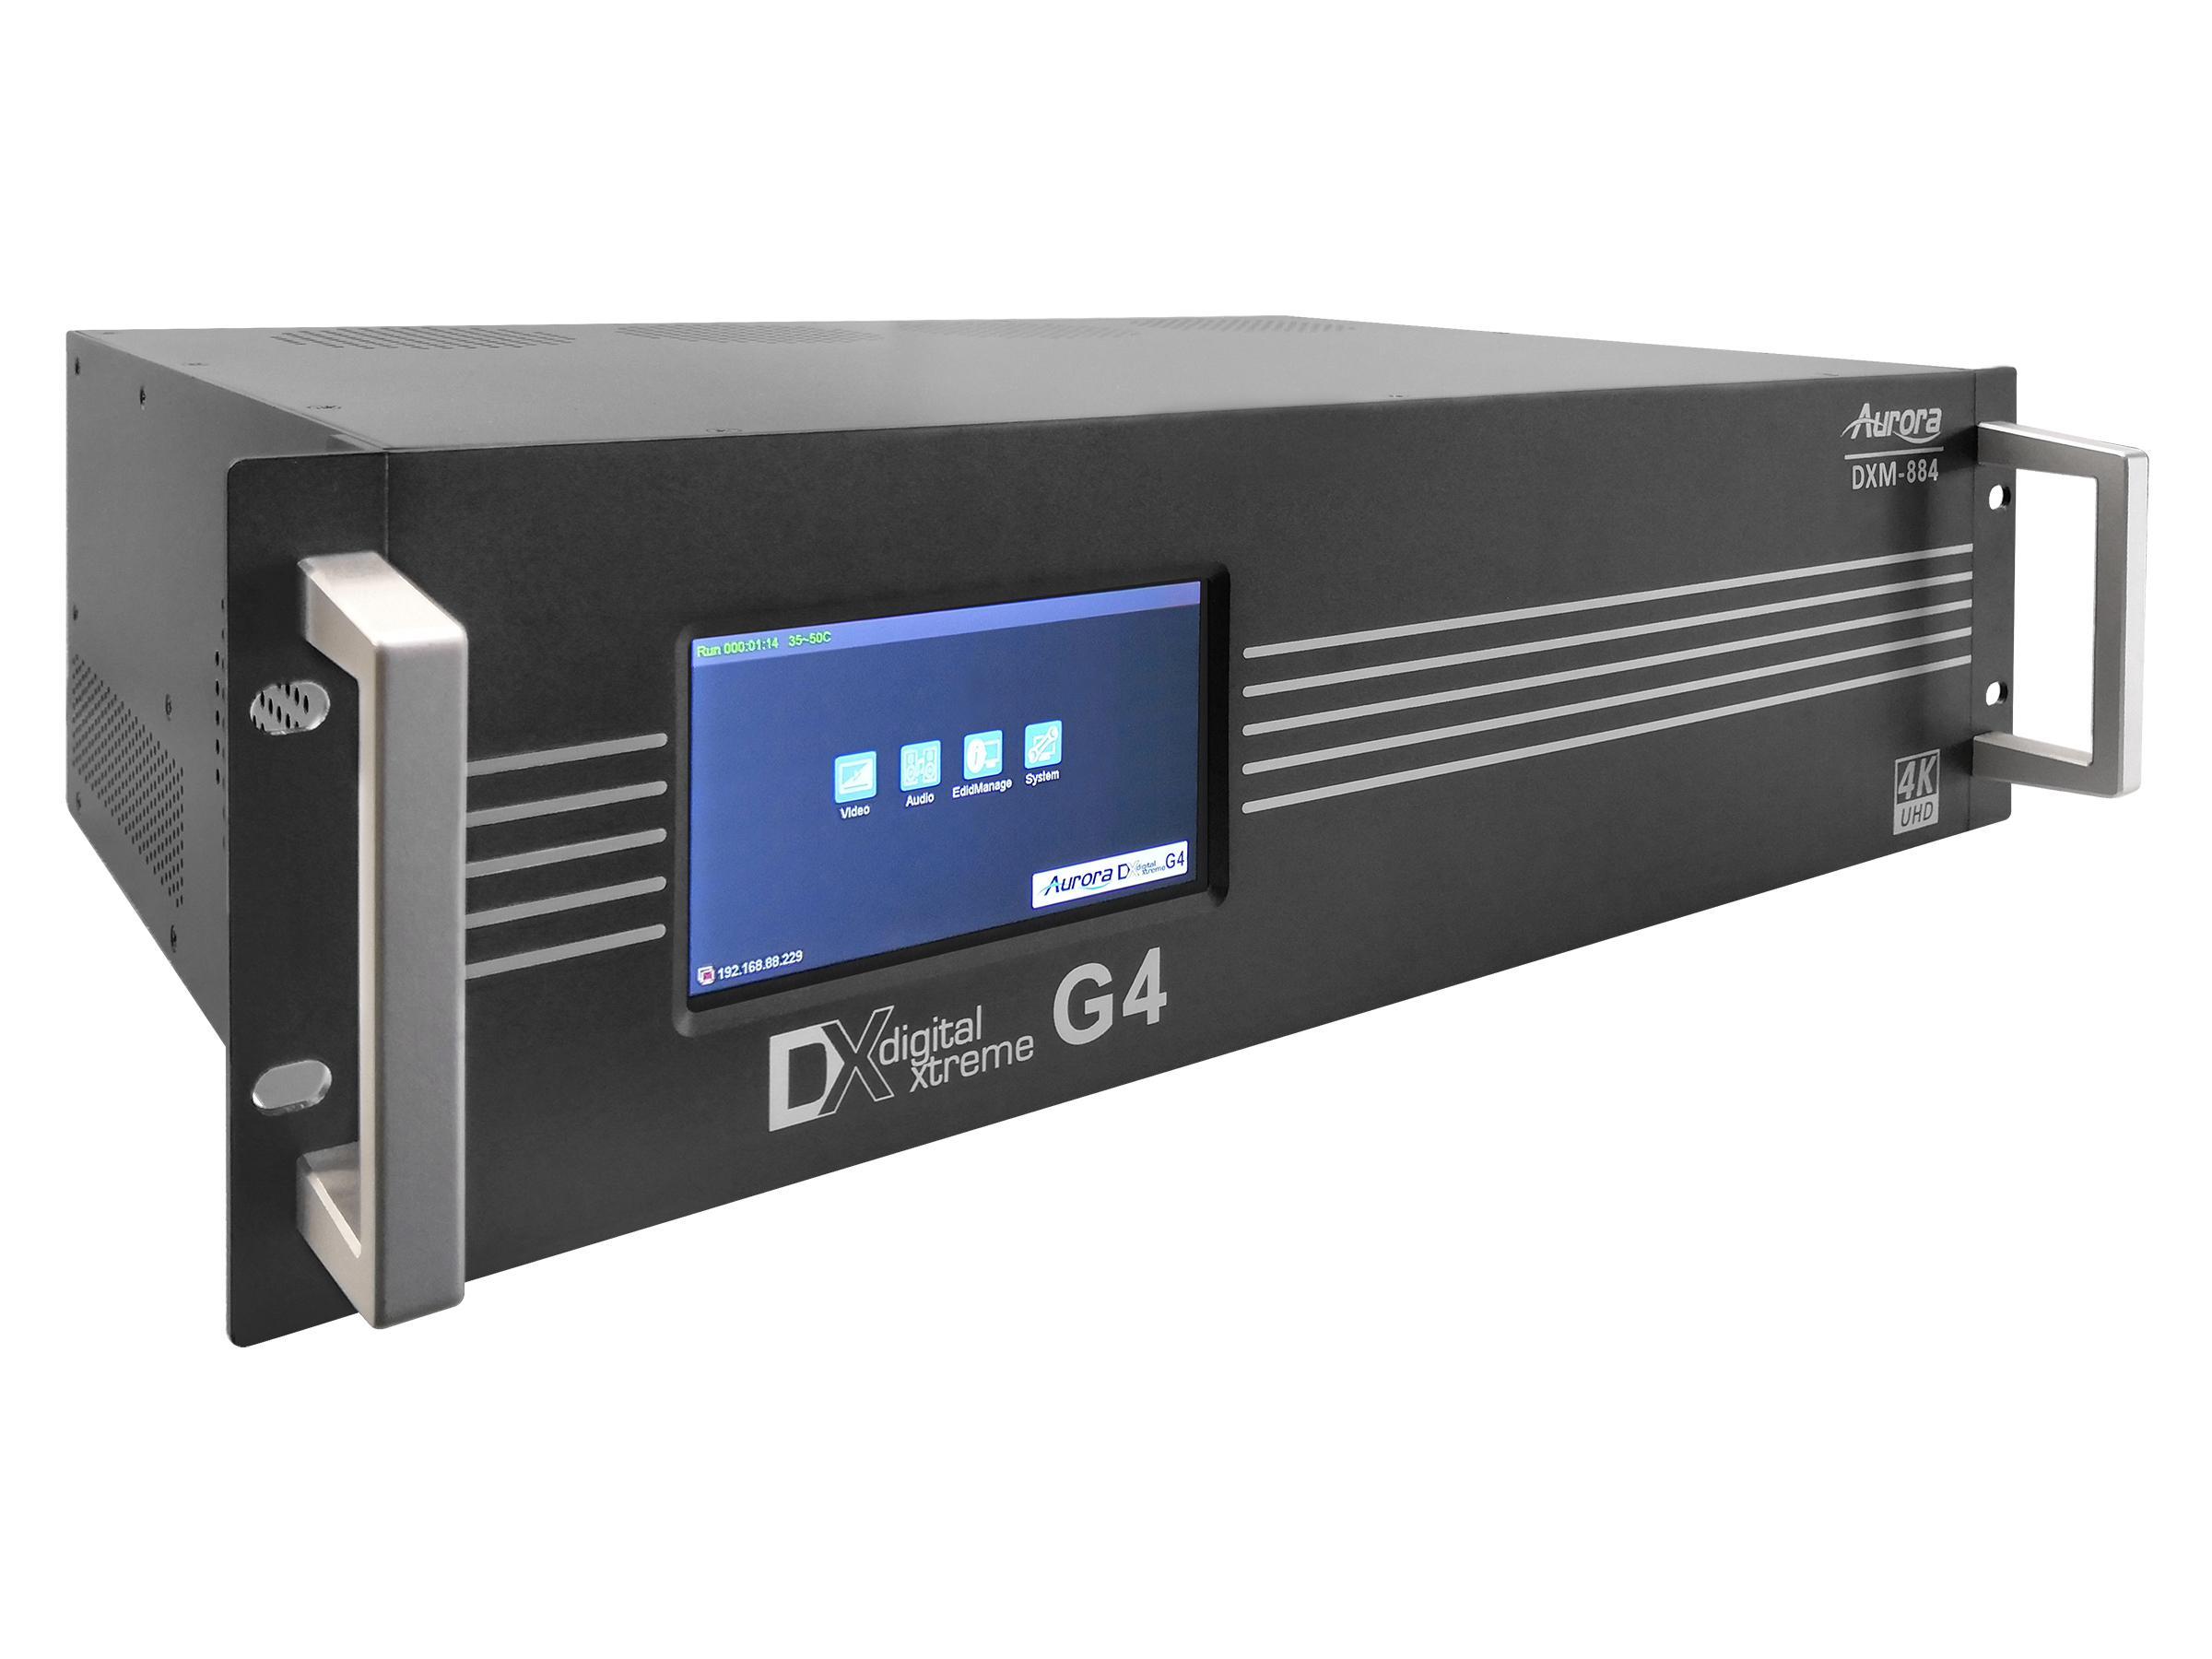 Aurora Multimedia DXM-884-G4 4K60 Modular 8x8 Matrix Switch